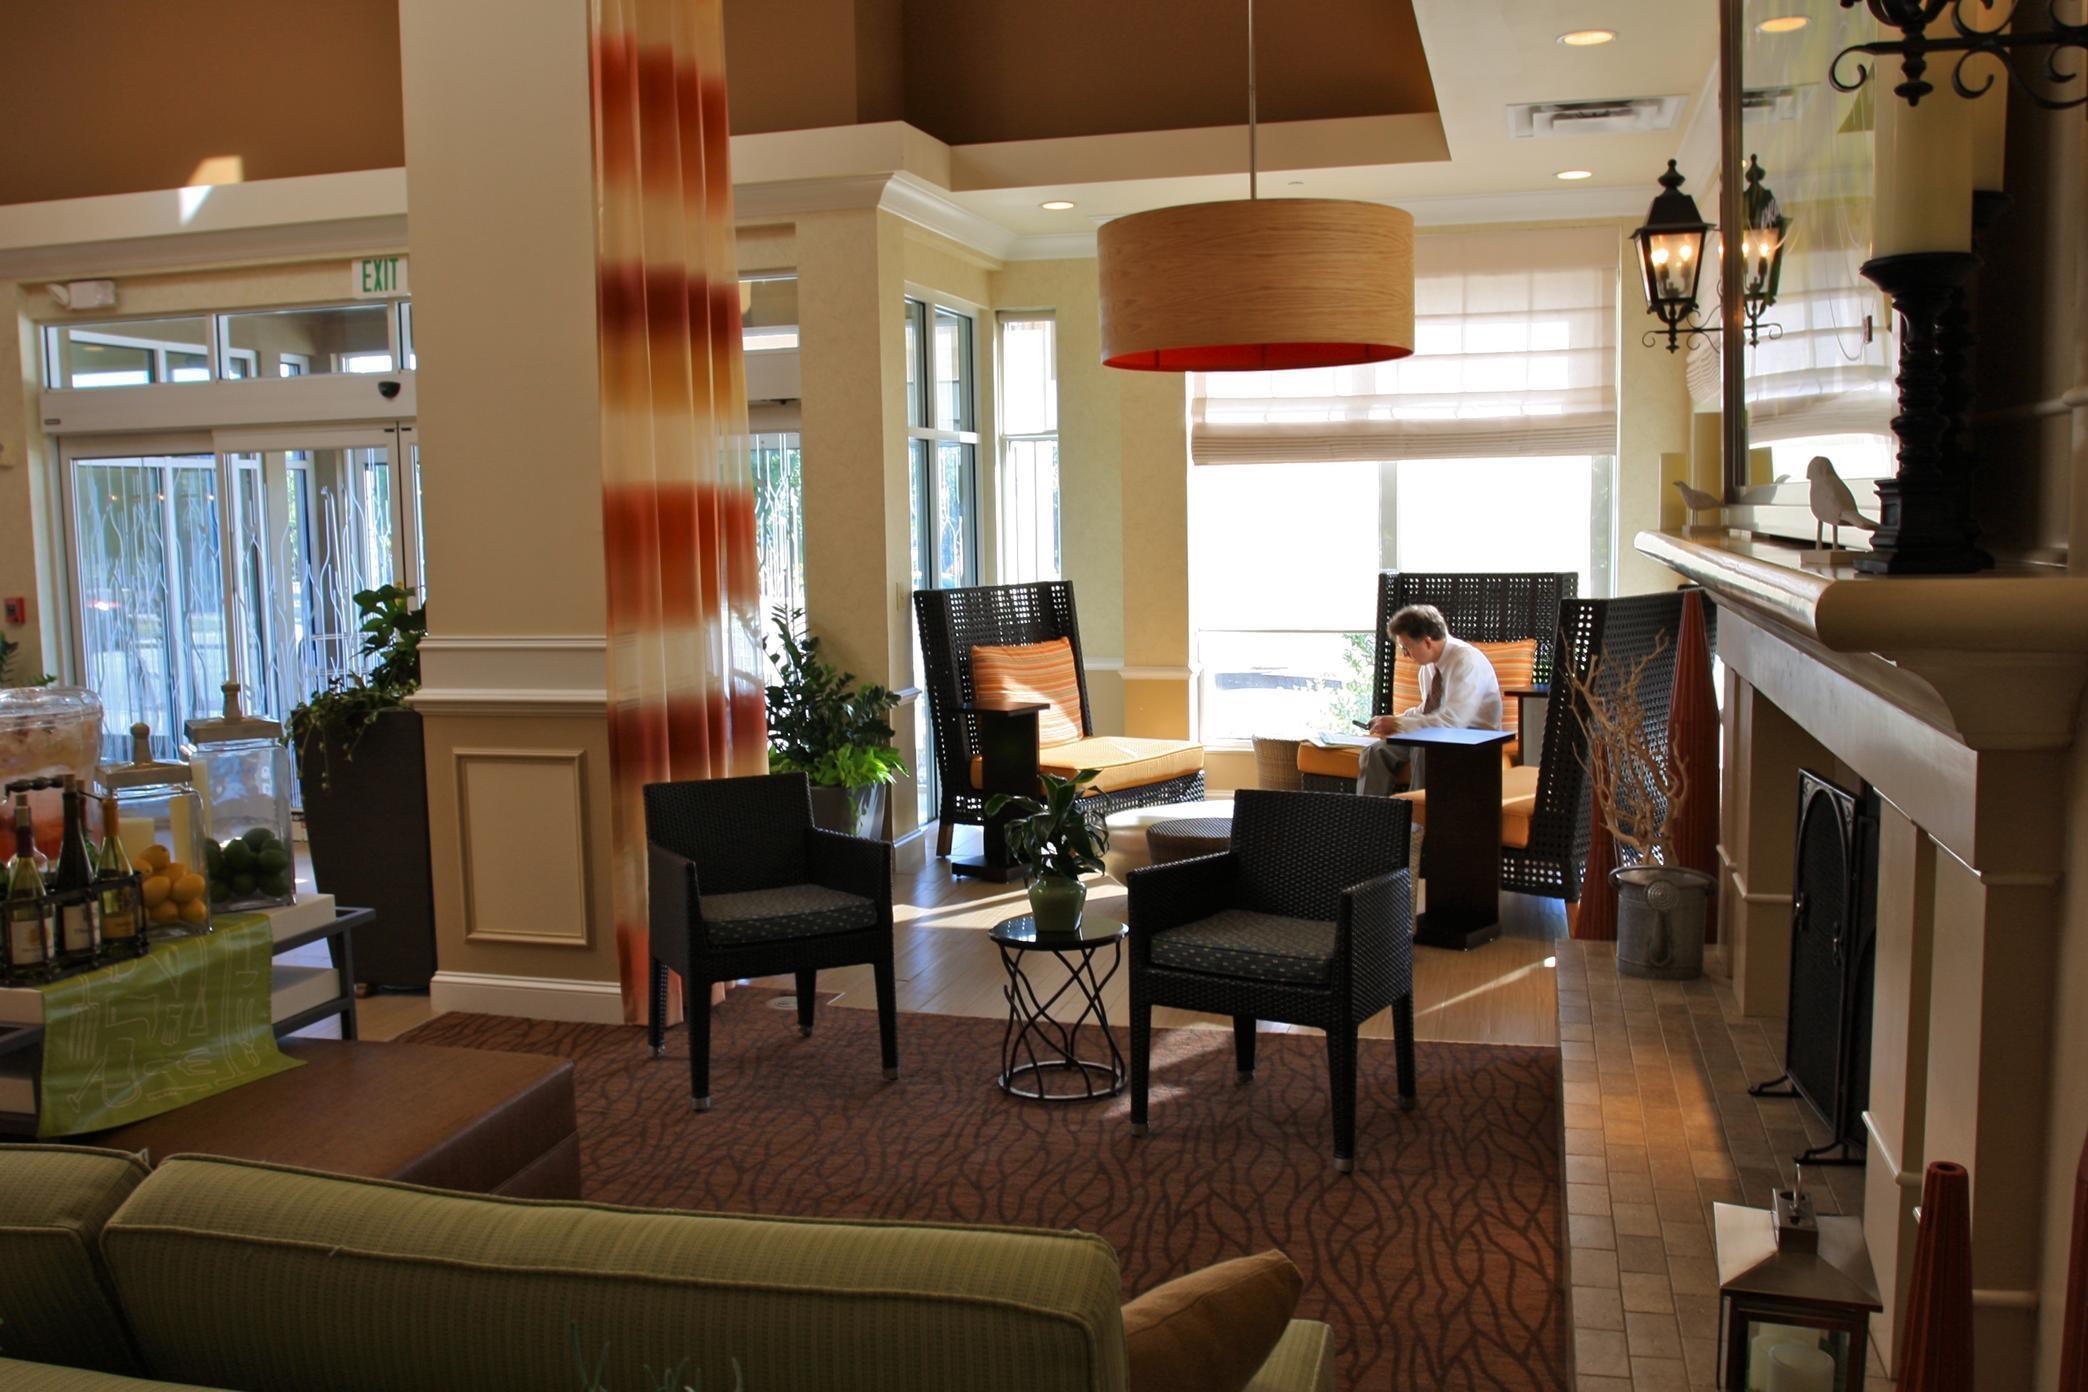 Hilton Garden Inn Albany 101 S Front Street Albany, GA Hotels ...